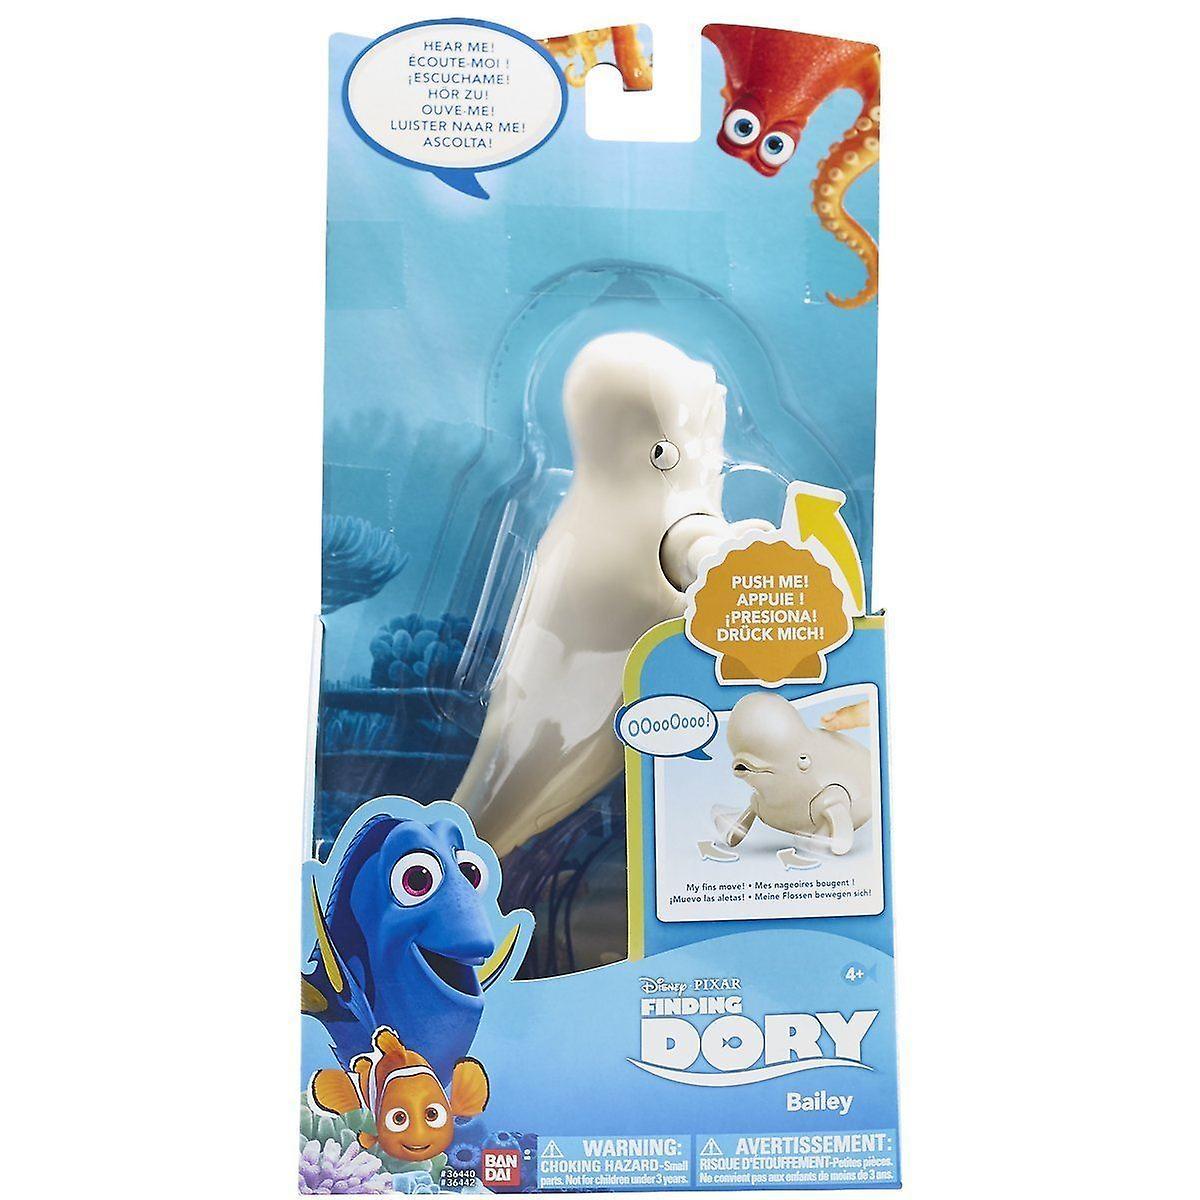 Disney Pixar Finding Dory Feature Figure - Bailey